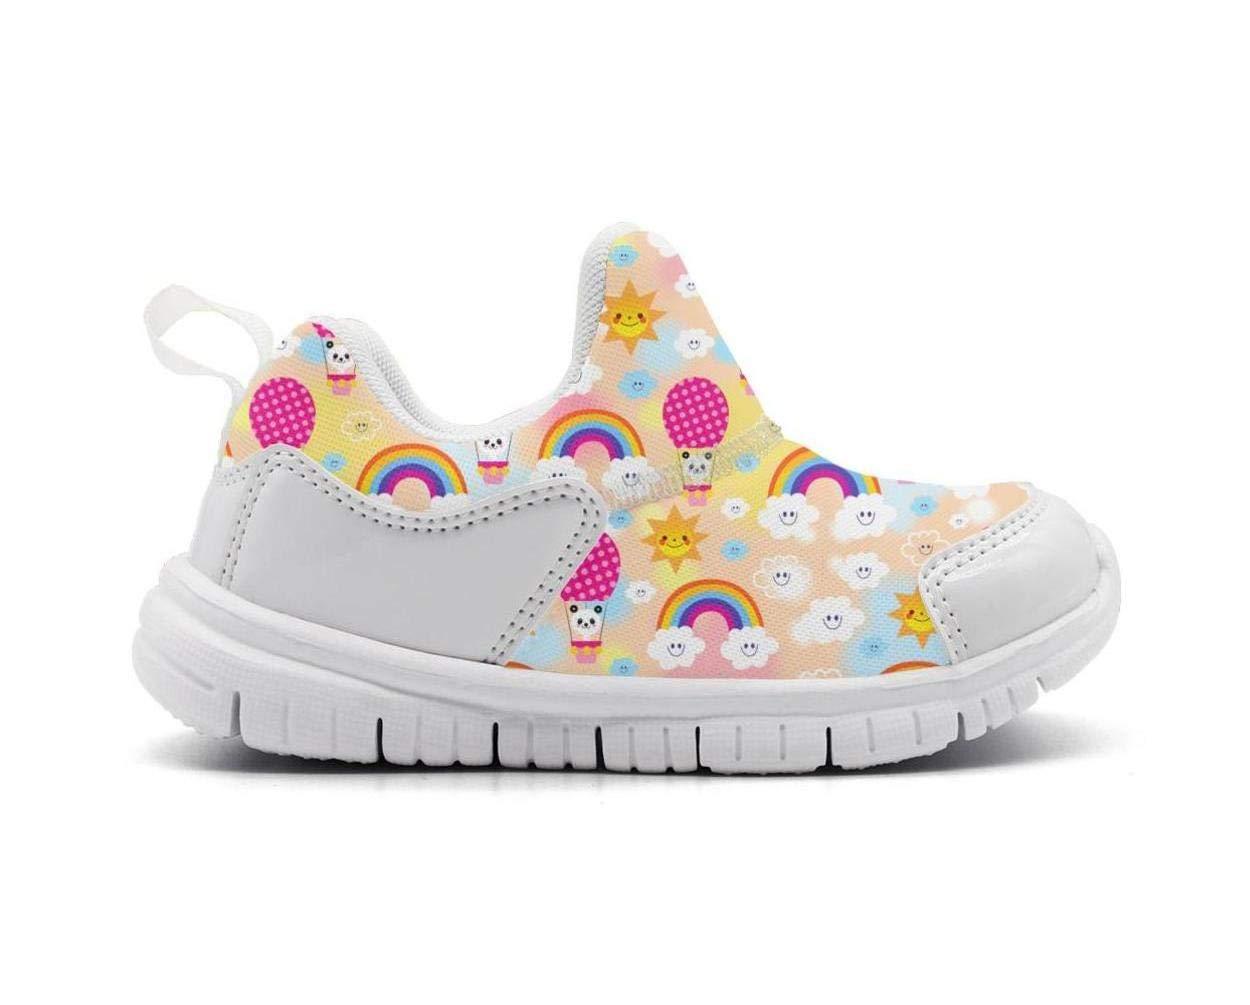 ONEYUAN Children Bear Panda Kid Casual Lightweight Sport Shoes Sneakers Running Shoes